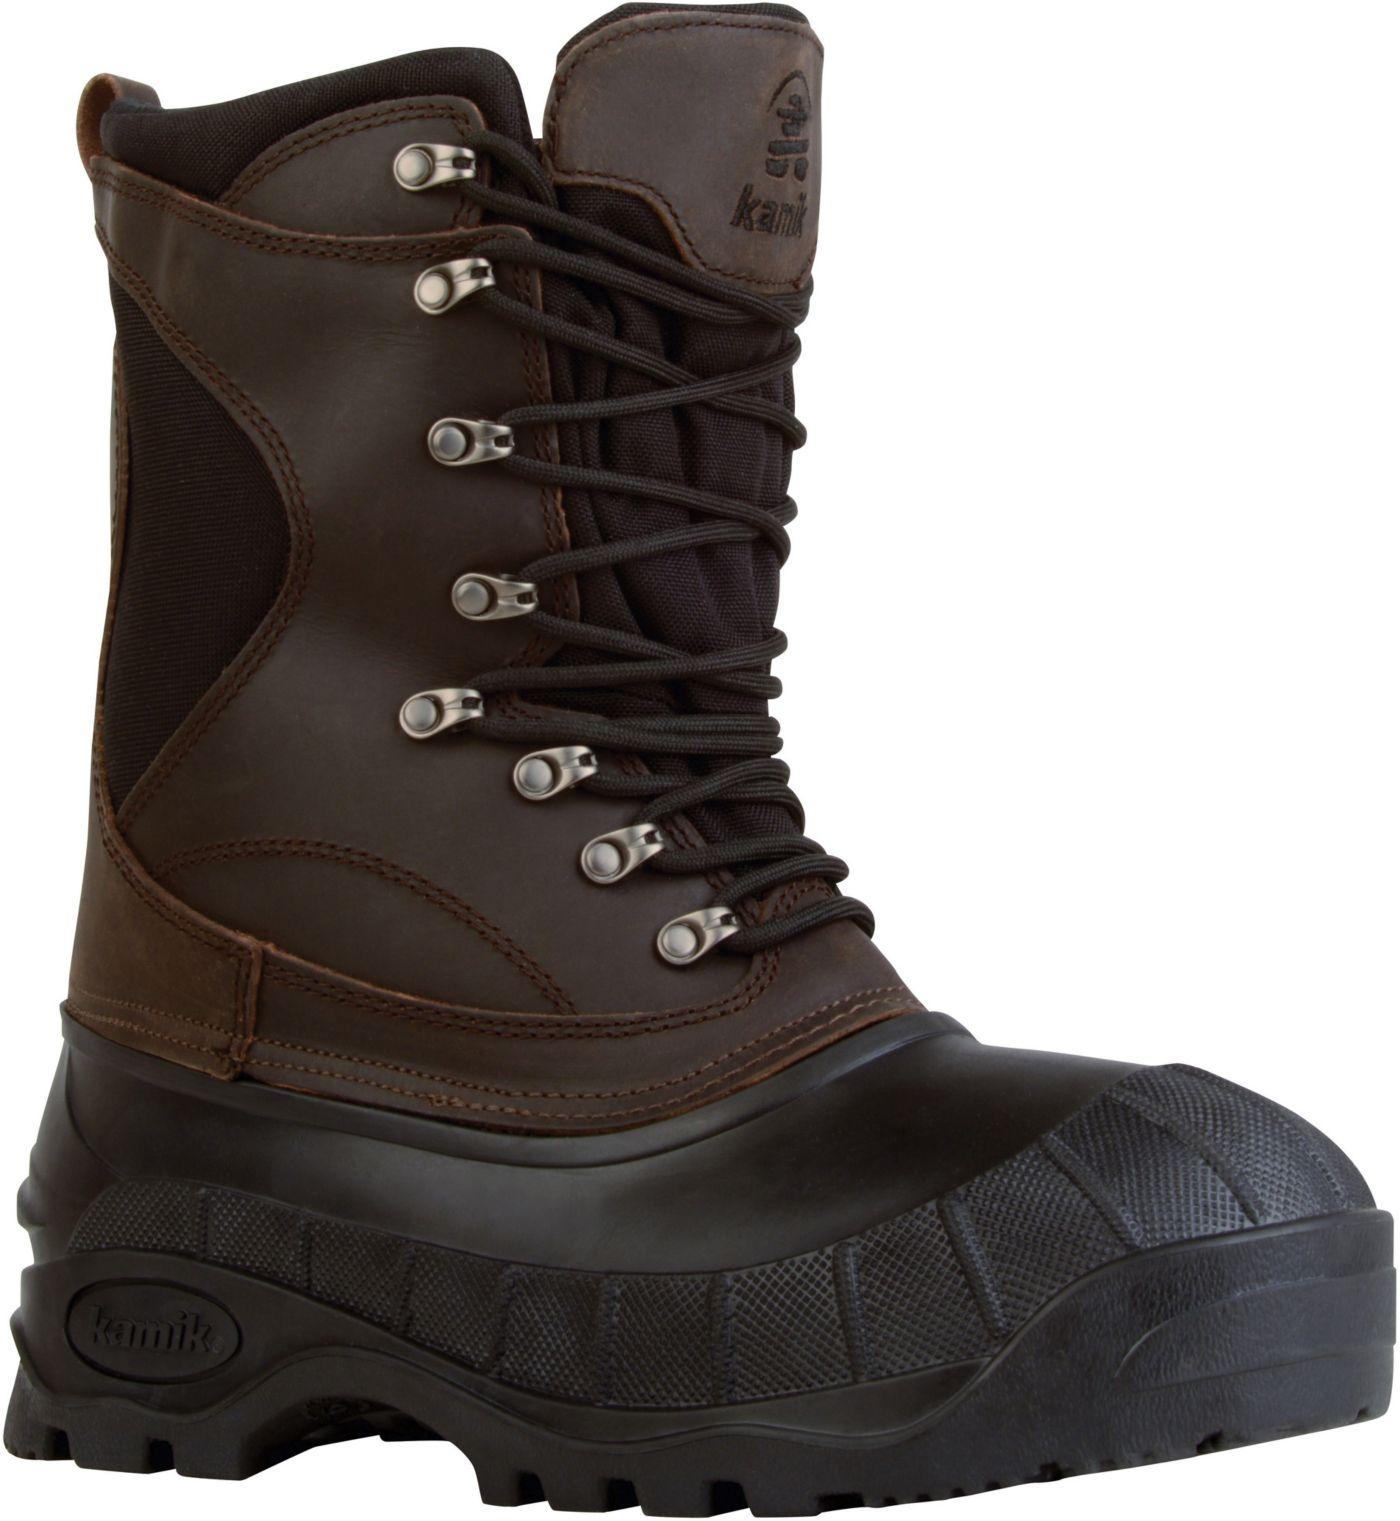 Kamik Men's Cody Insulated Waterproof Winter Boots